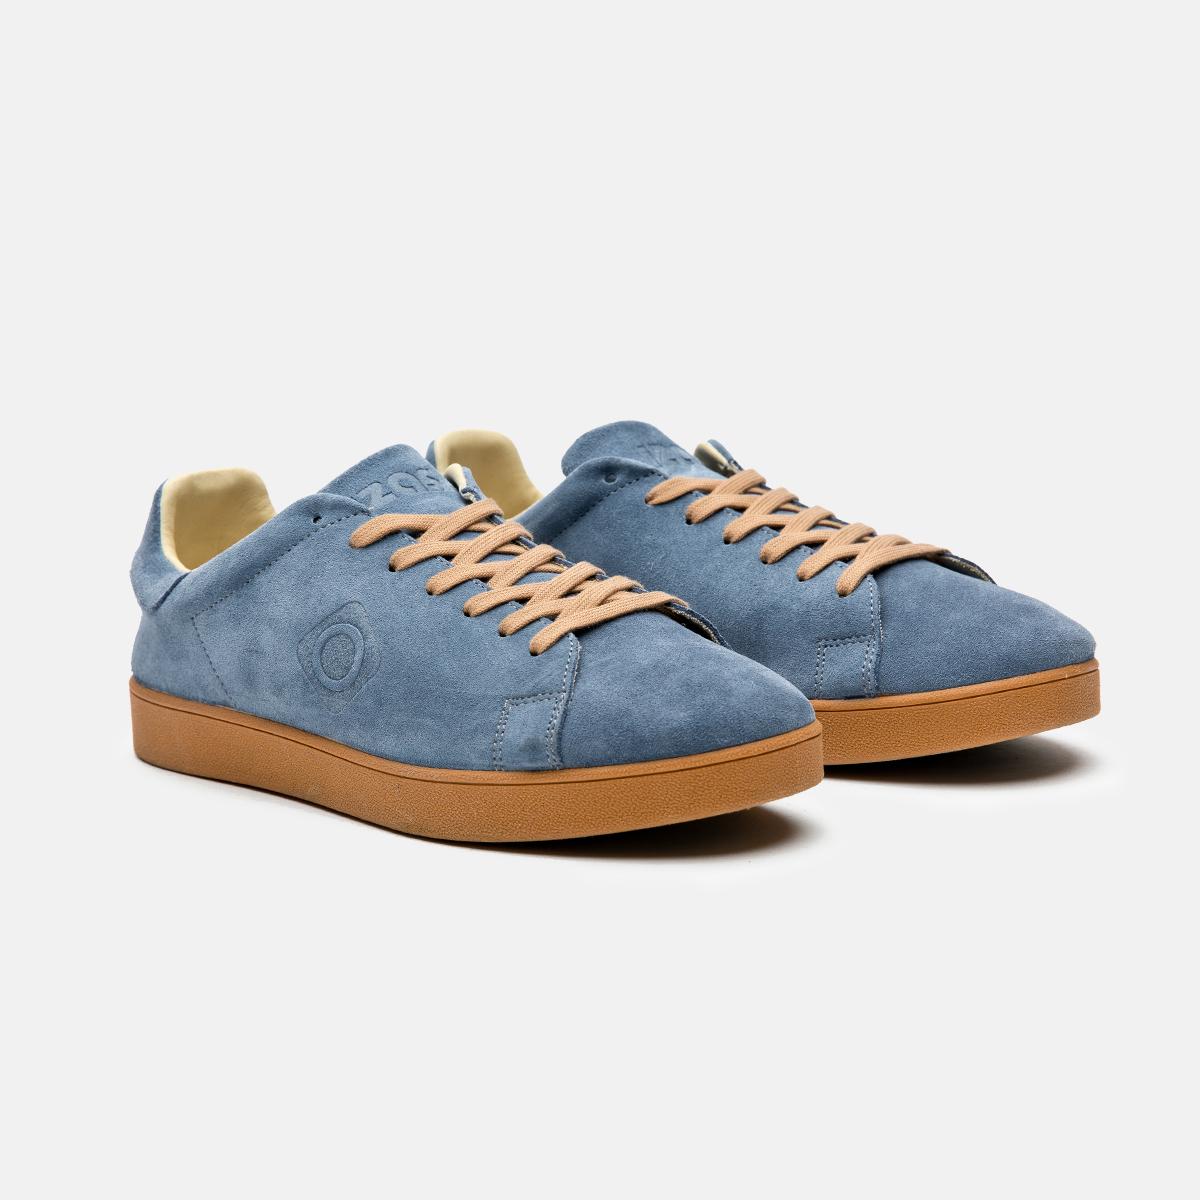 Zapatillas urbanas recicladas azul Savia